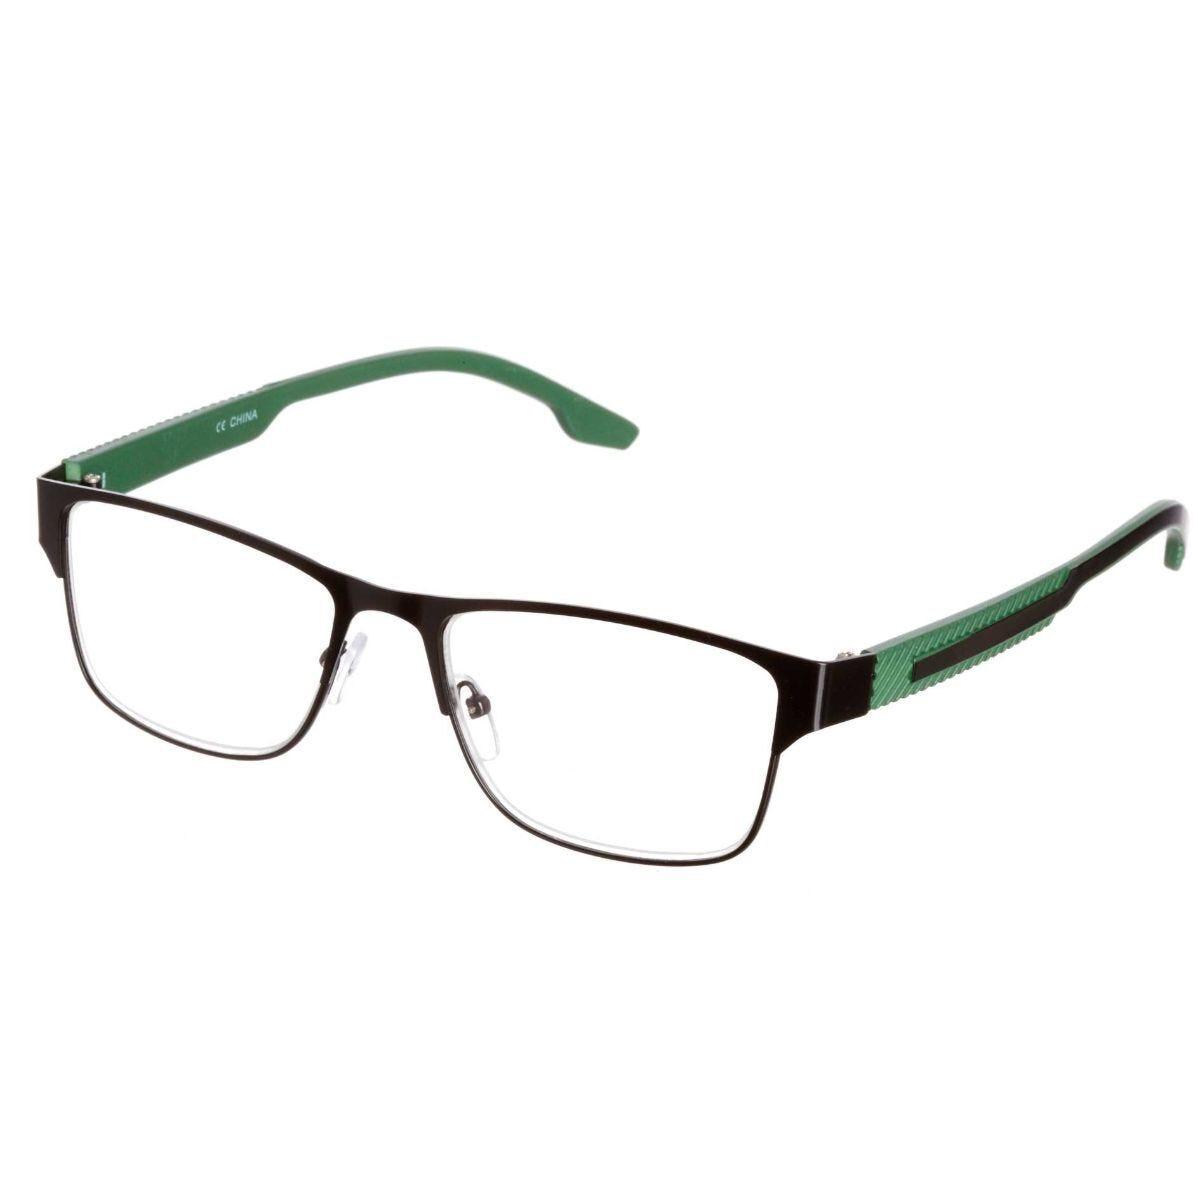 Ryman Reading Glasses + 1.5 Black and Green Frame